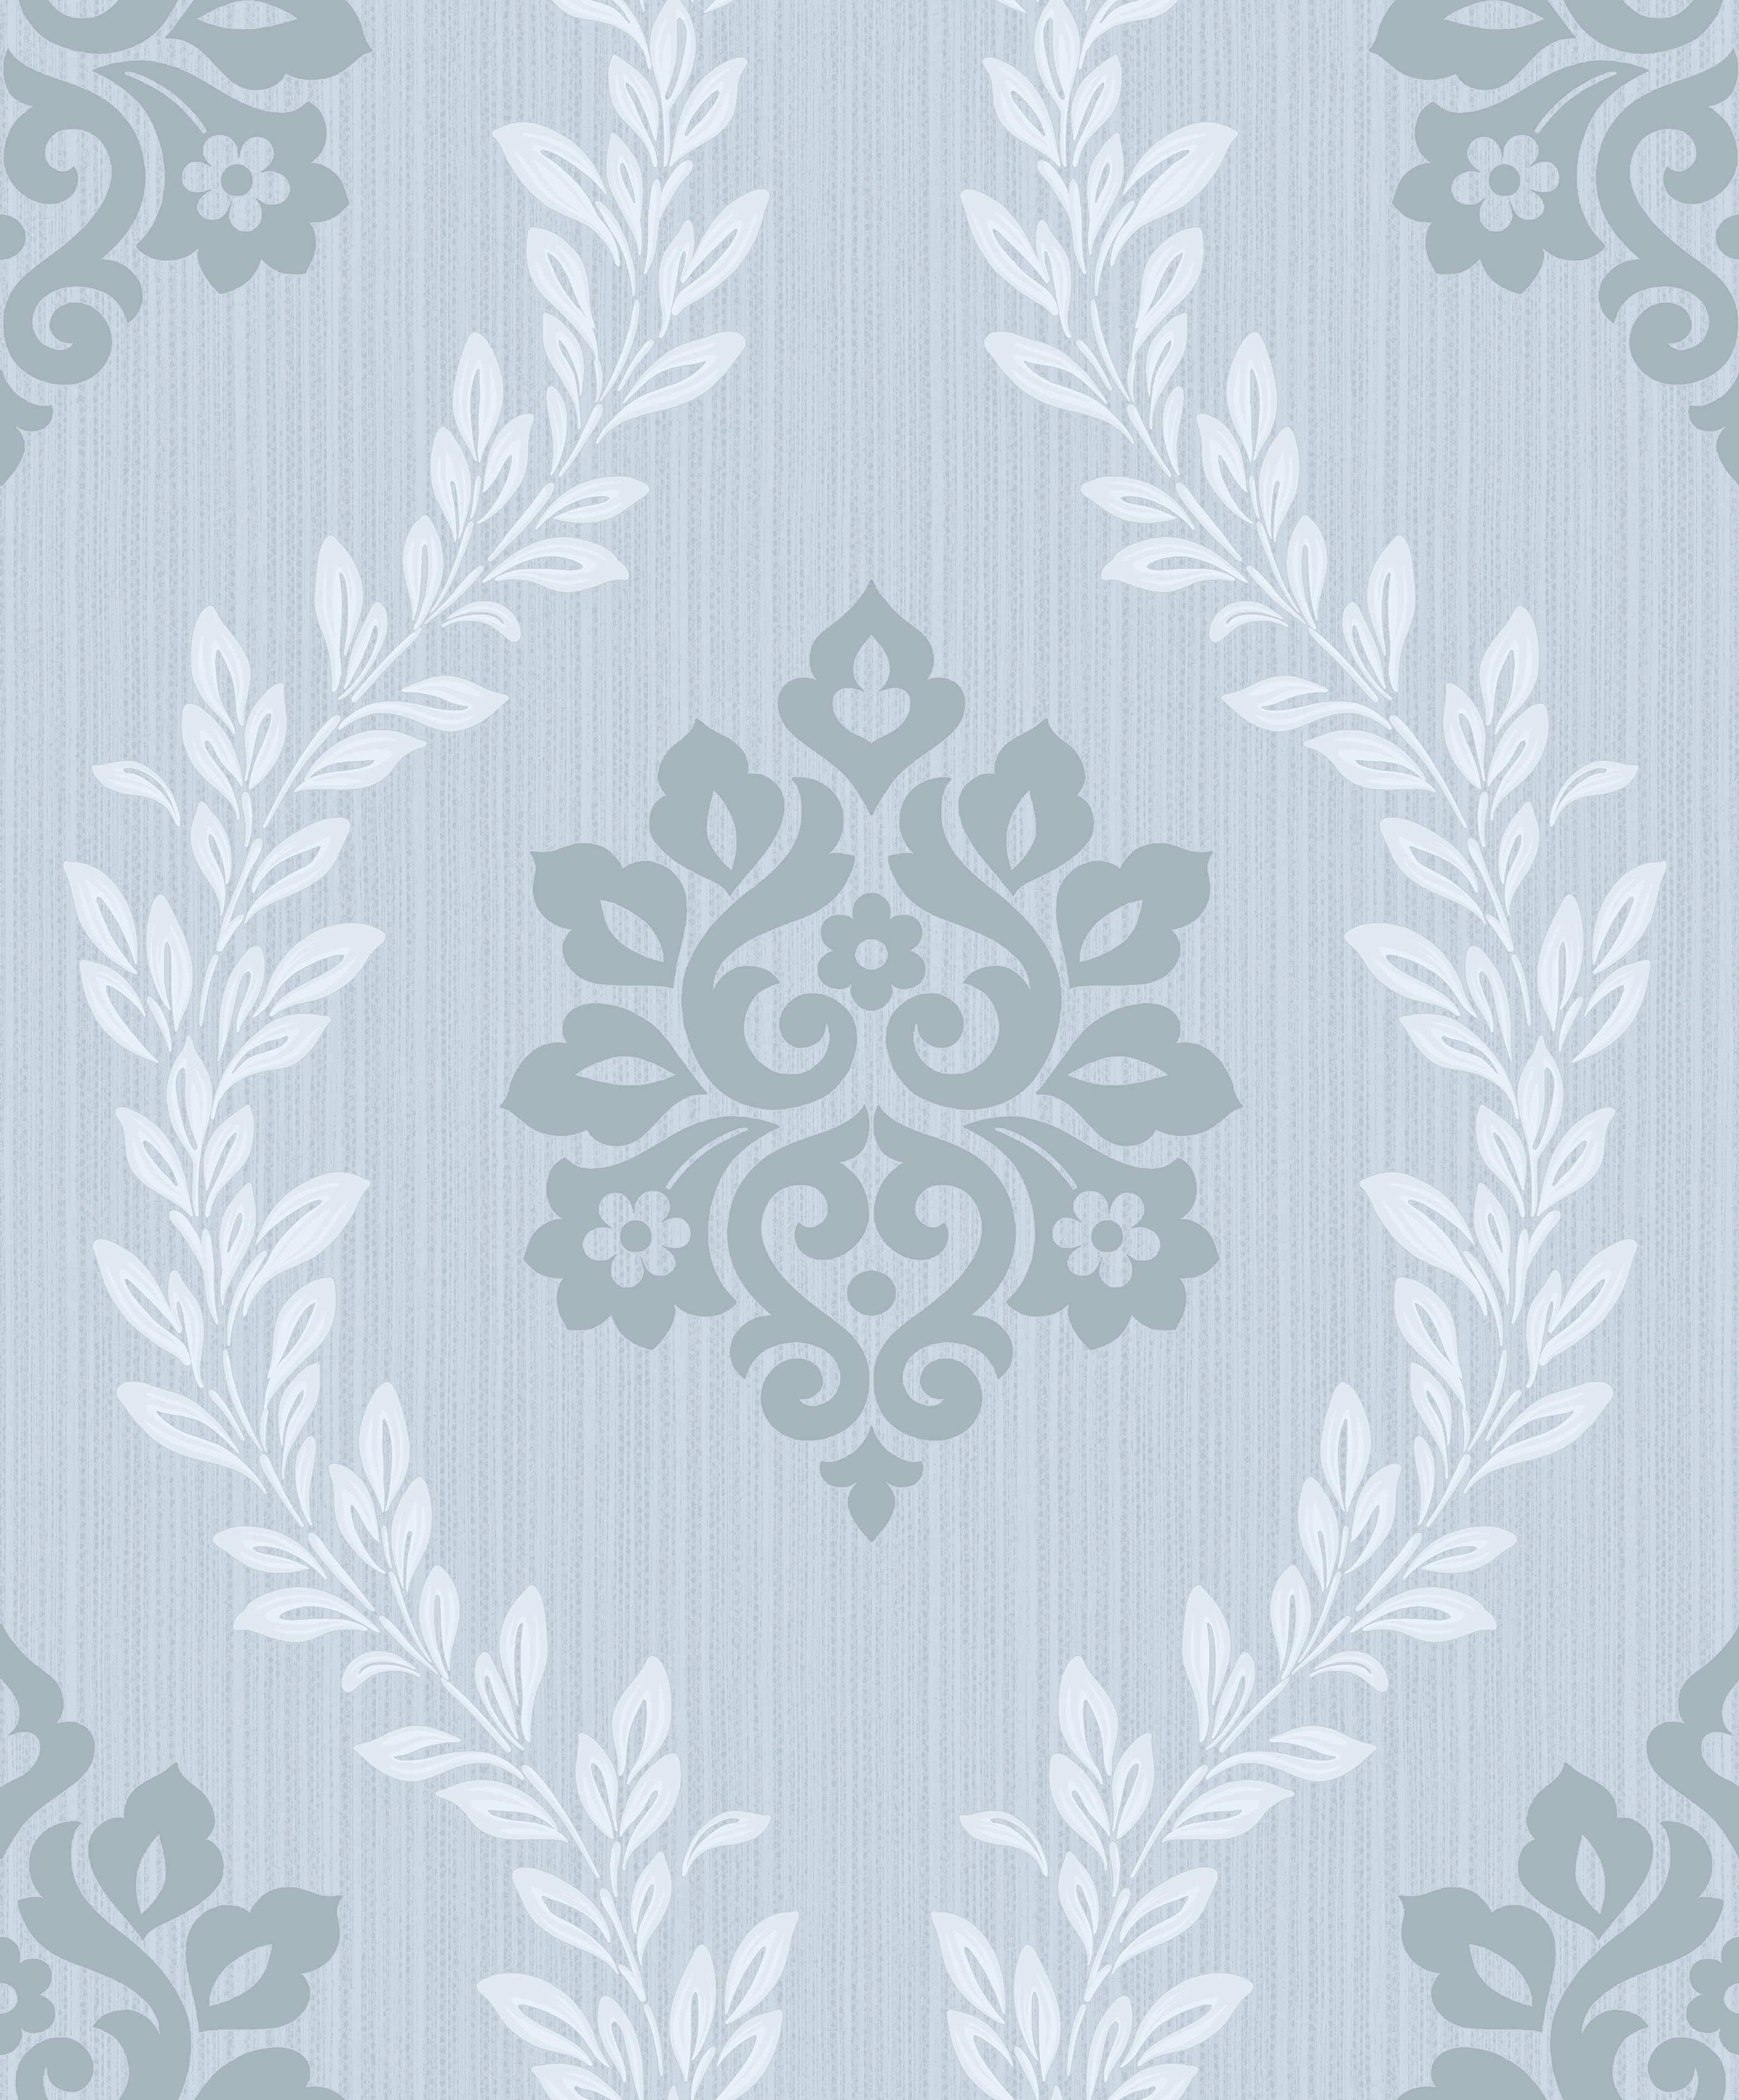 Vliestapete Barock Ornament Pastellblau Glanz Barock Tapete Tapeten Hochwertige Tapeten